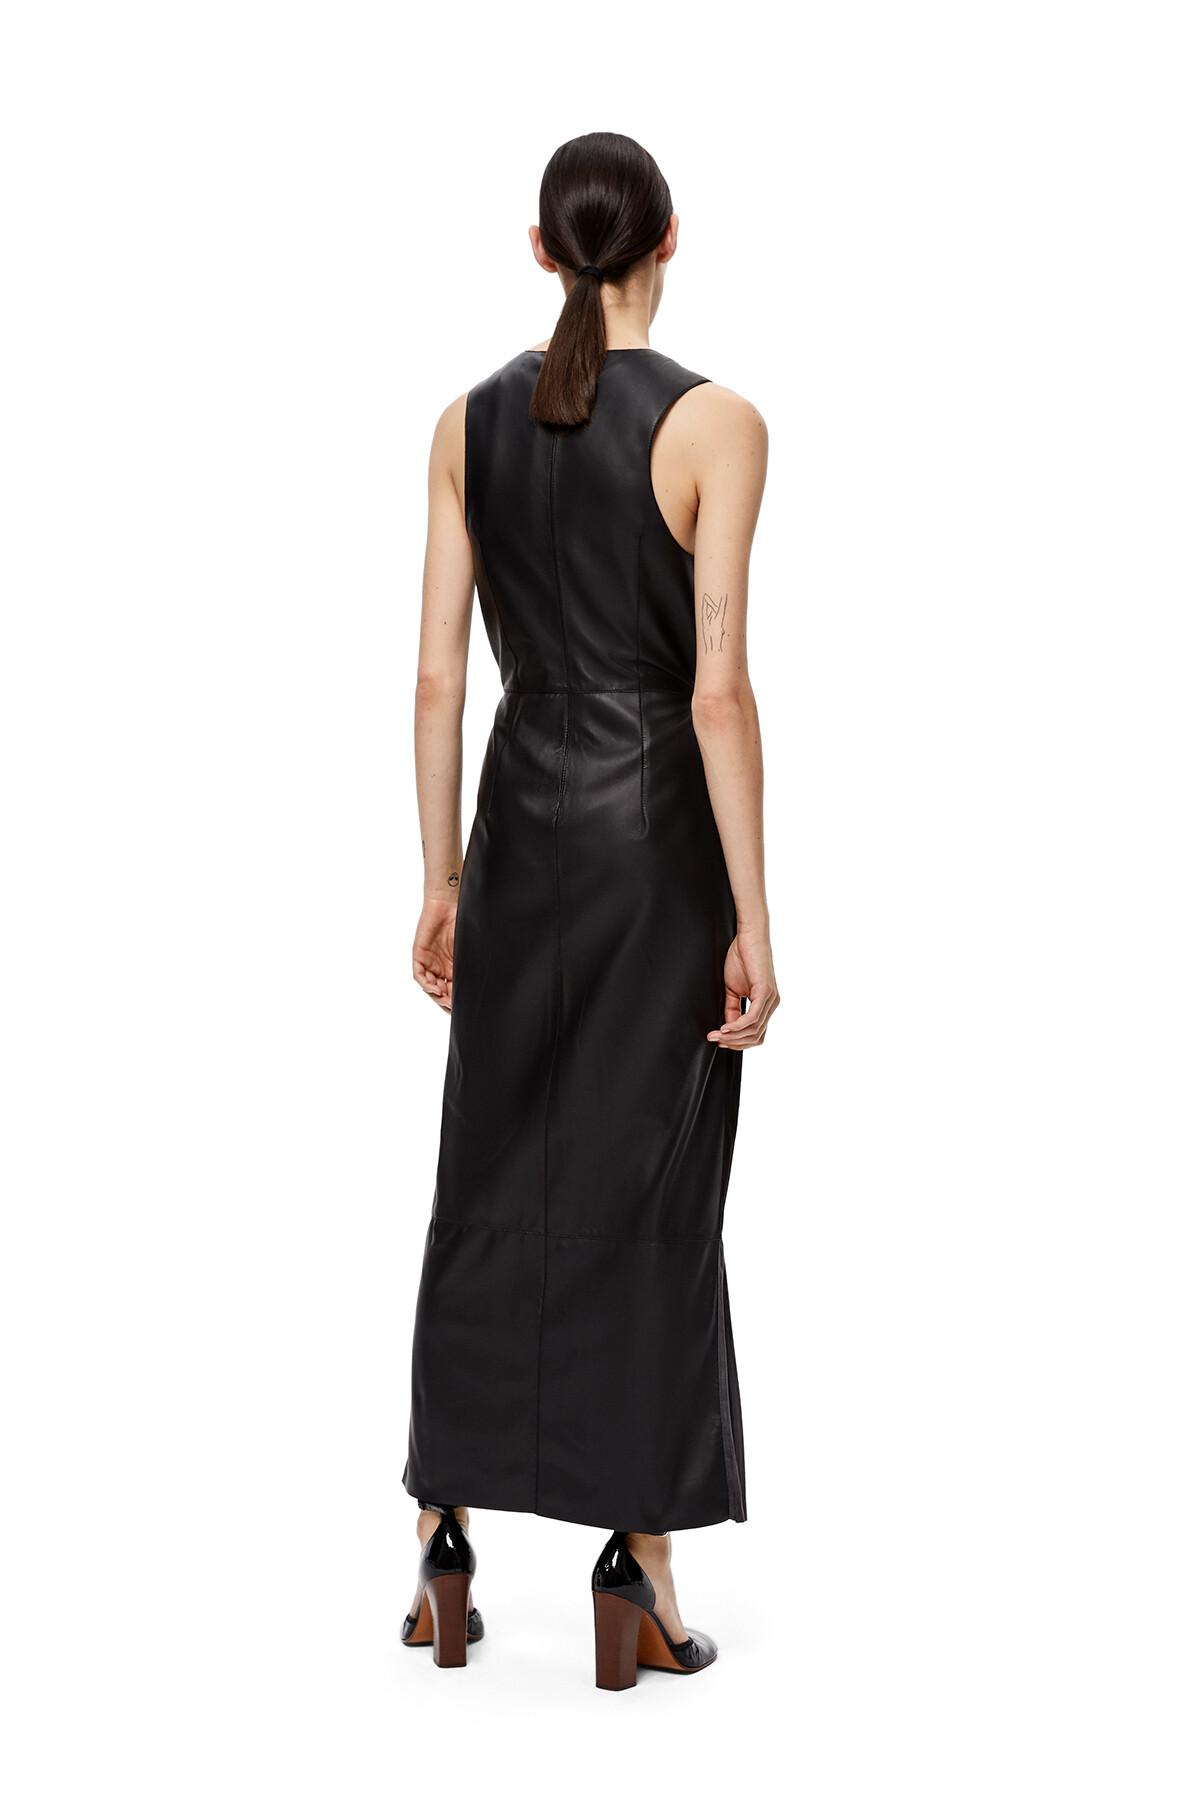 LOEWE V-Neck Sleeveless Dress Black/Grey front